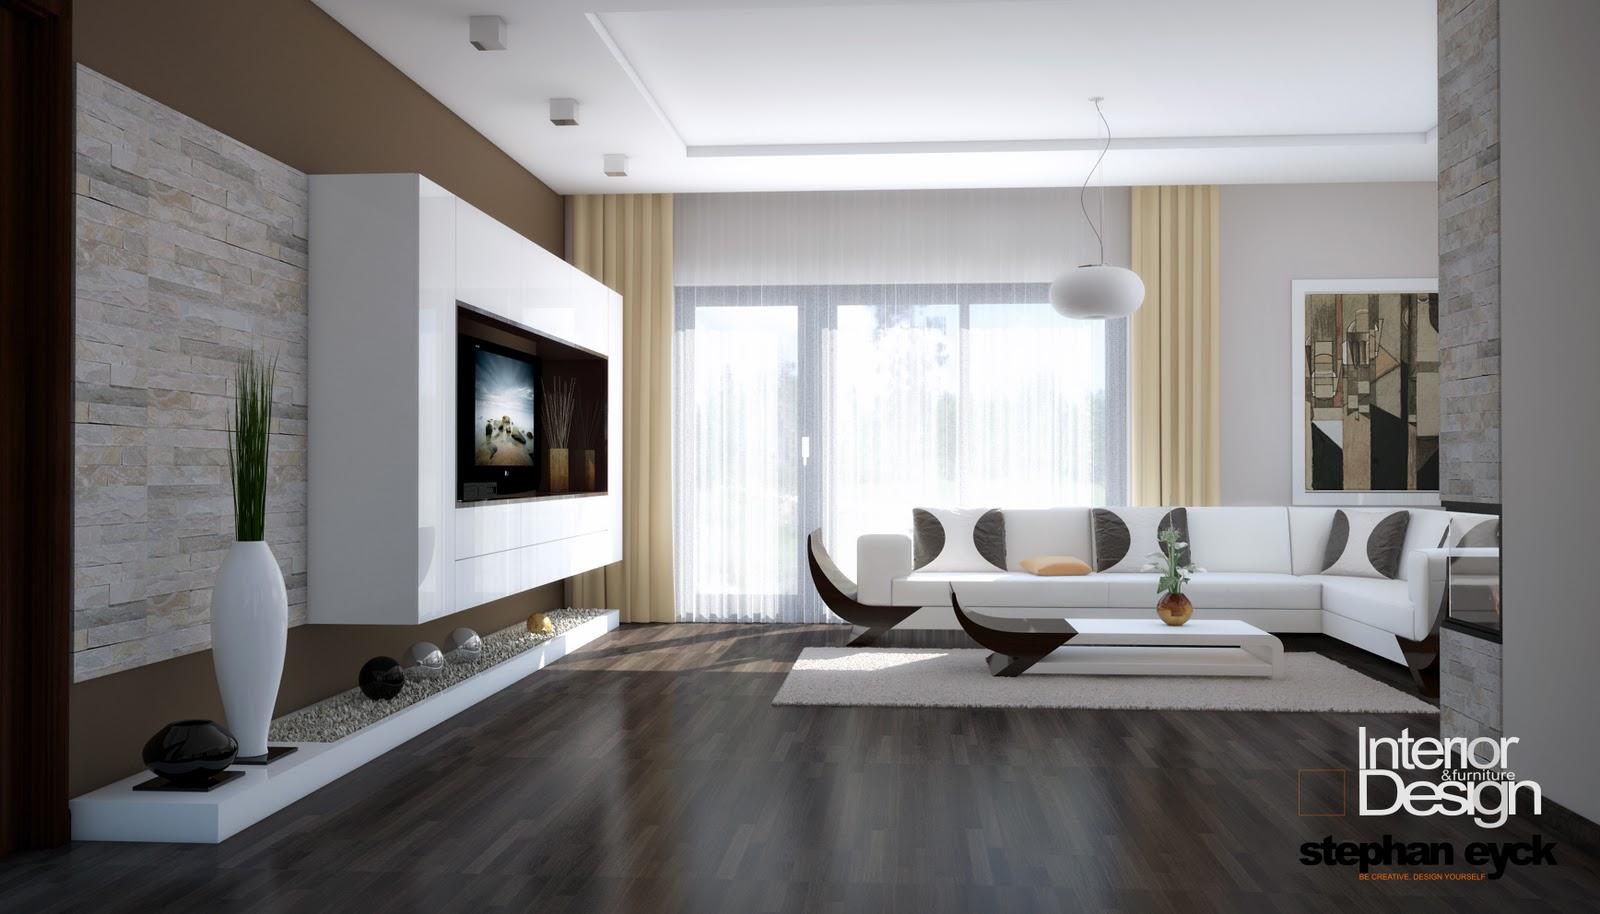 Outstanding STEPHAN EYCK - design interior: DESIGN INTERIOR CASA PITESTI  1600 x 914 · 176 kB · jpeg